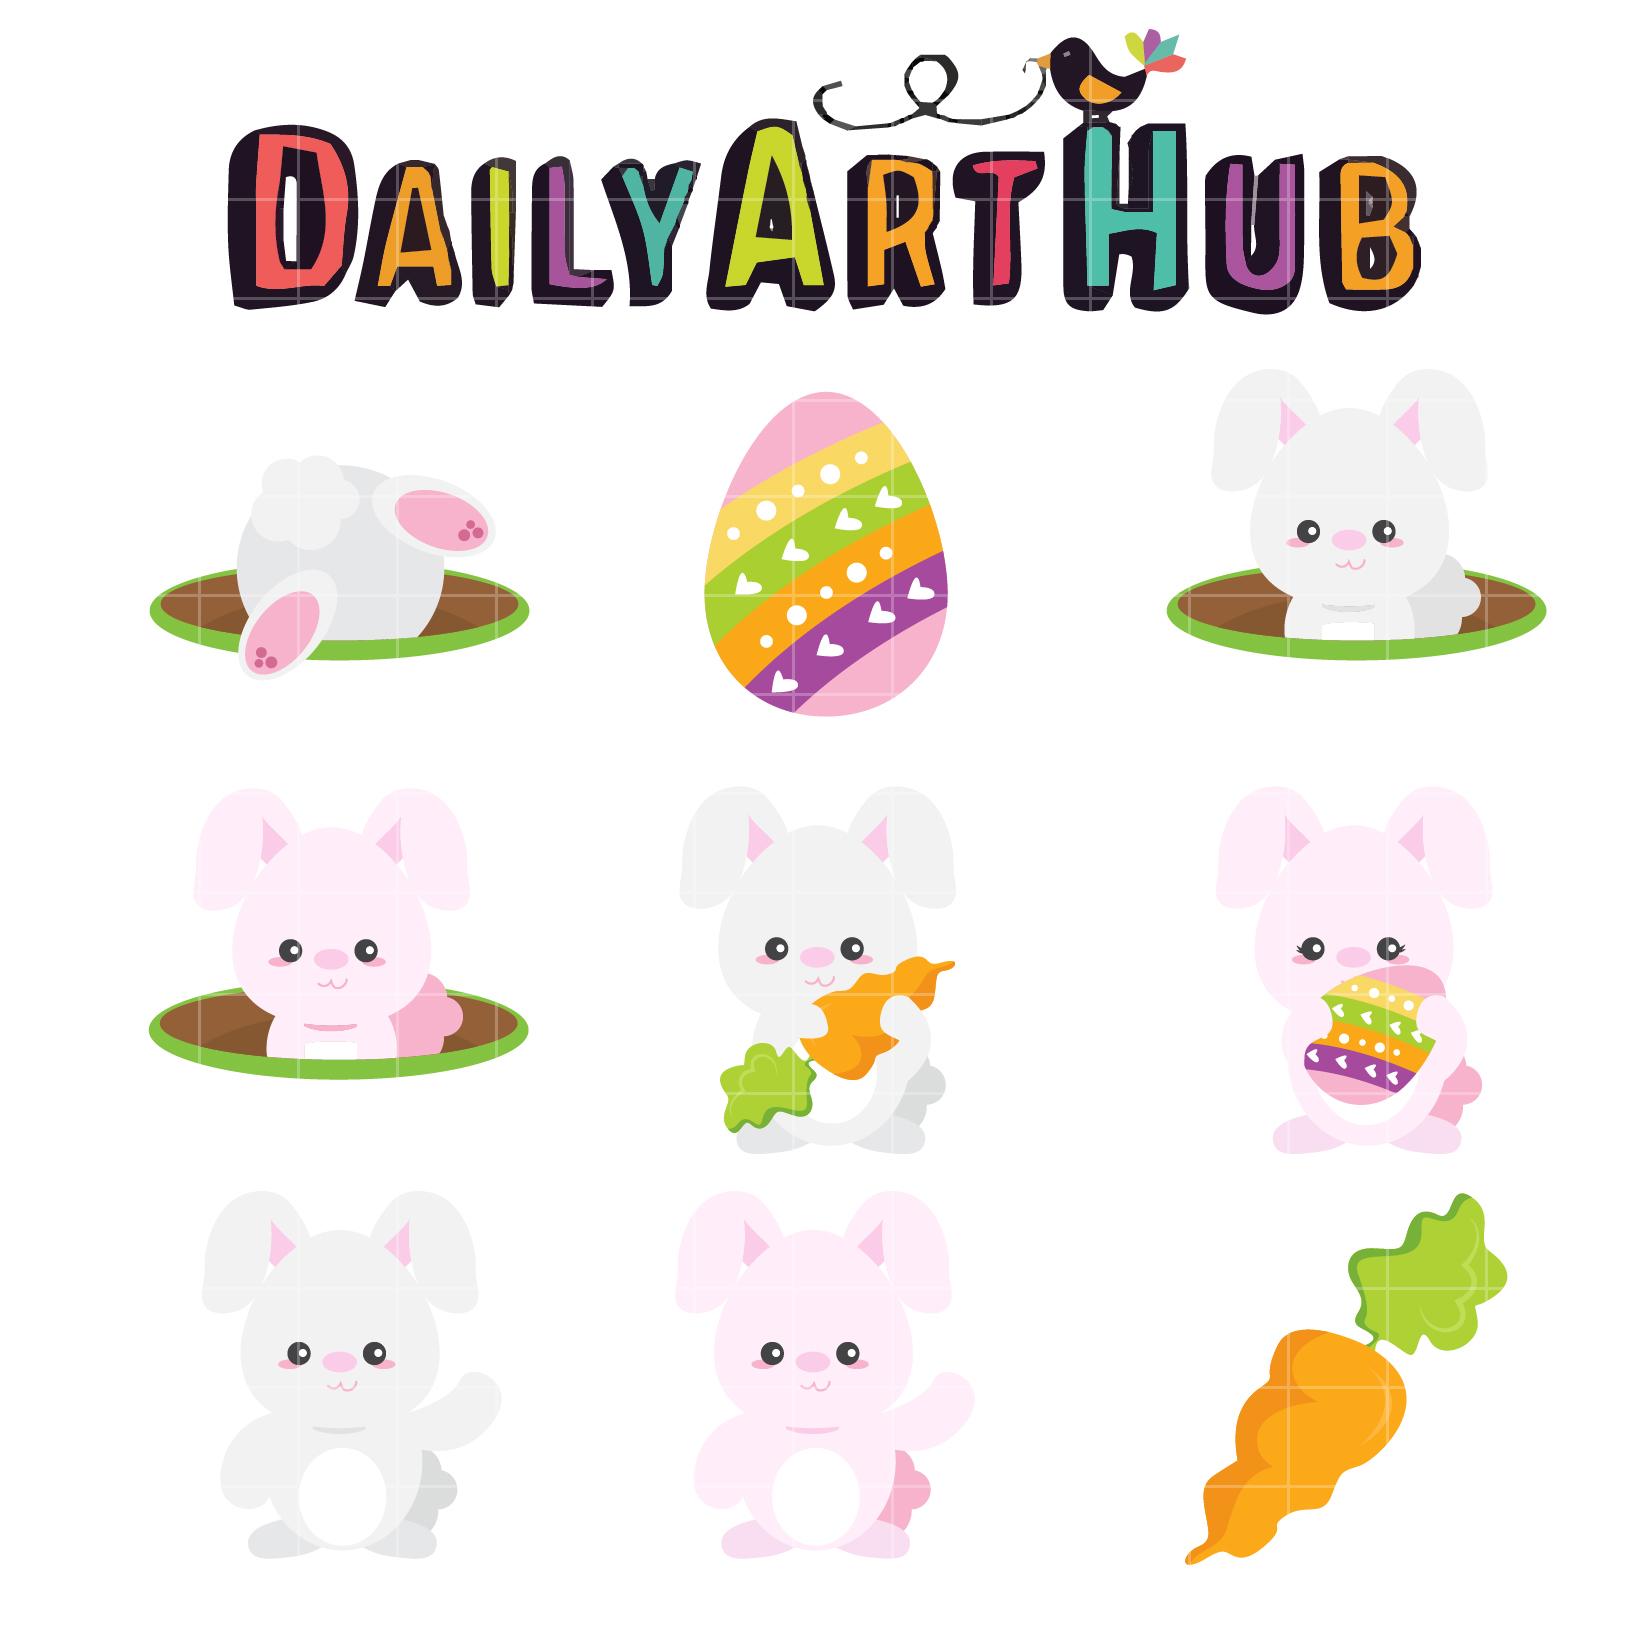 Cute Easter Bunny Clip Art Set | Daily Art Hub